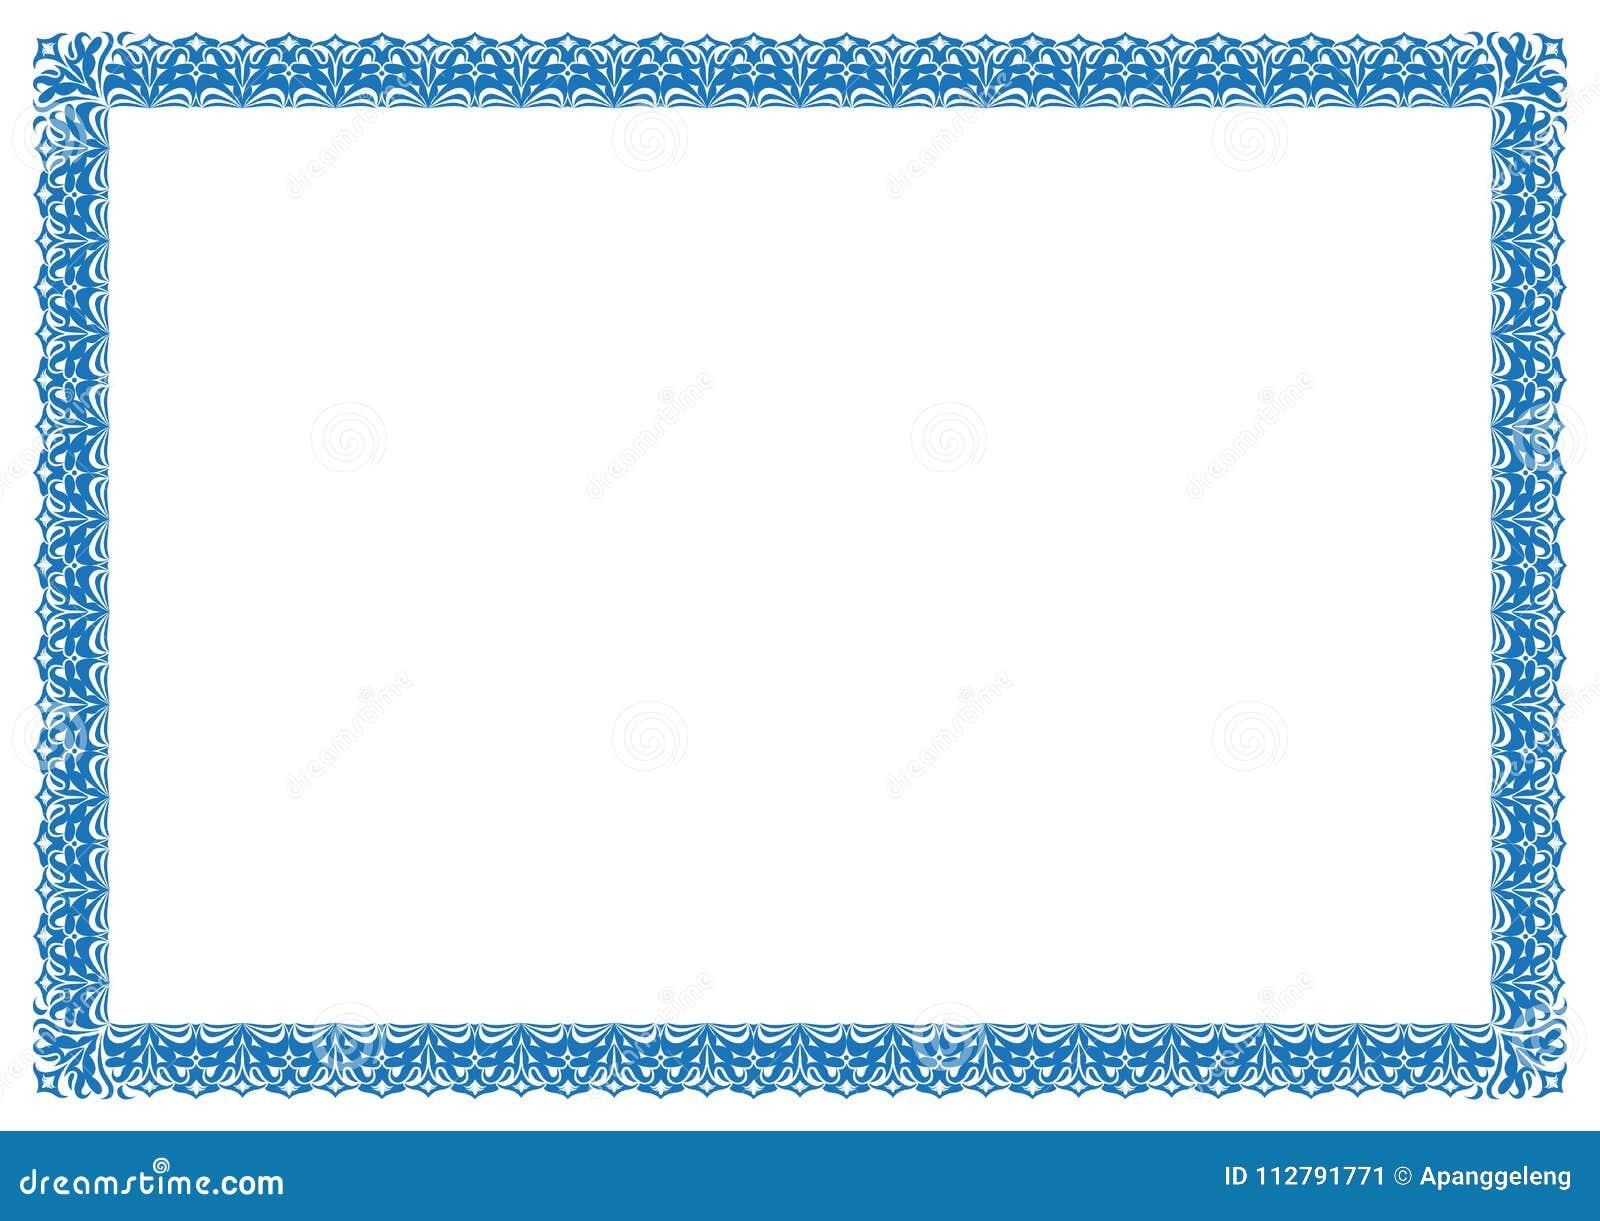 Nice Word Zertifikat Borders Festooning - FORTSETZUNG ARBEITSBLATT ...